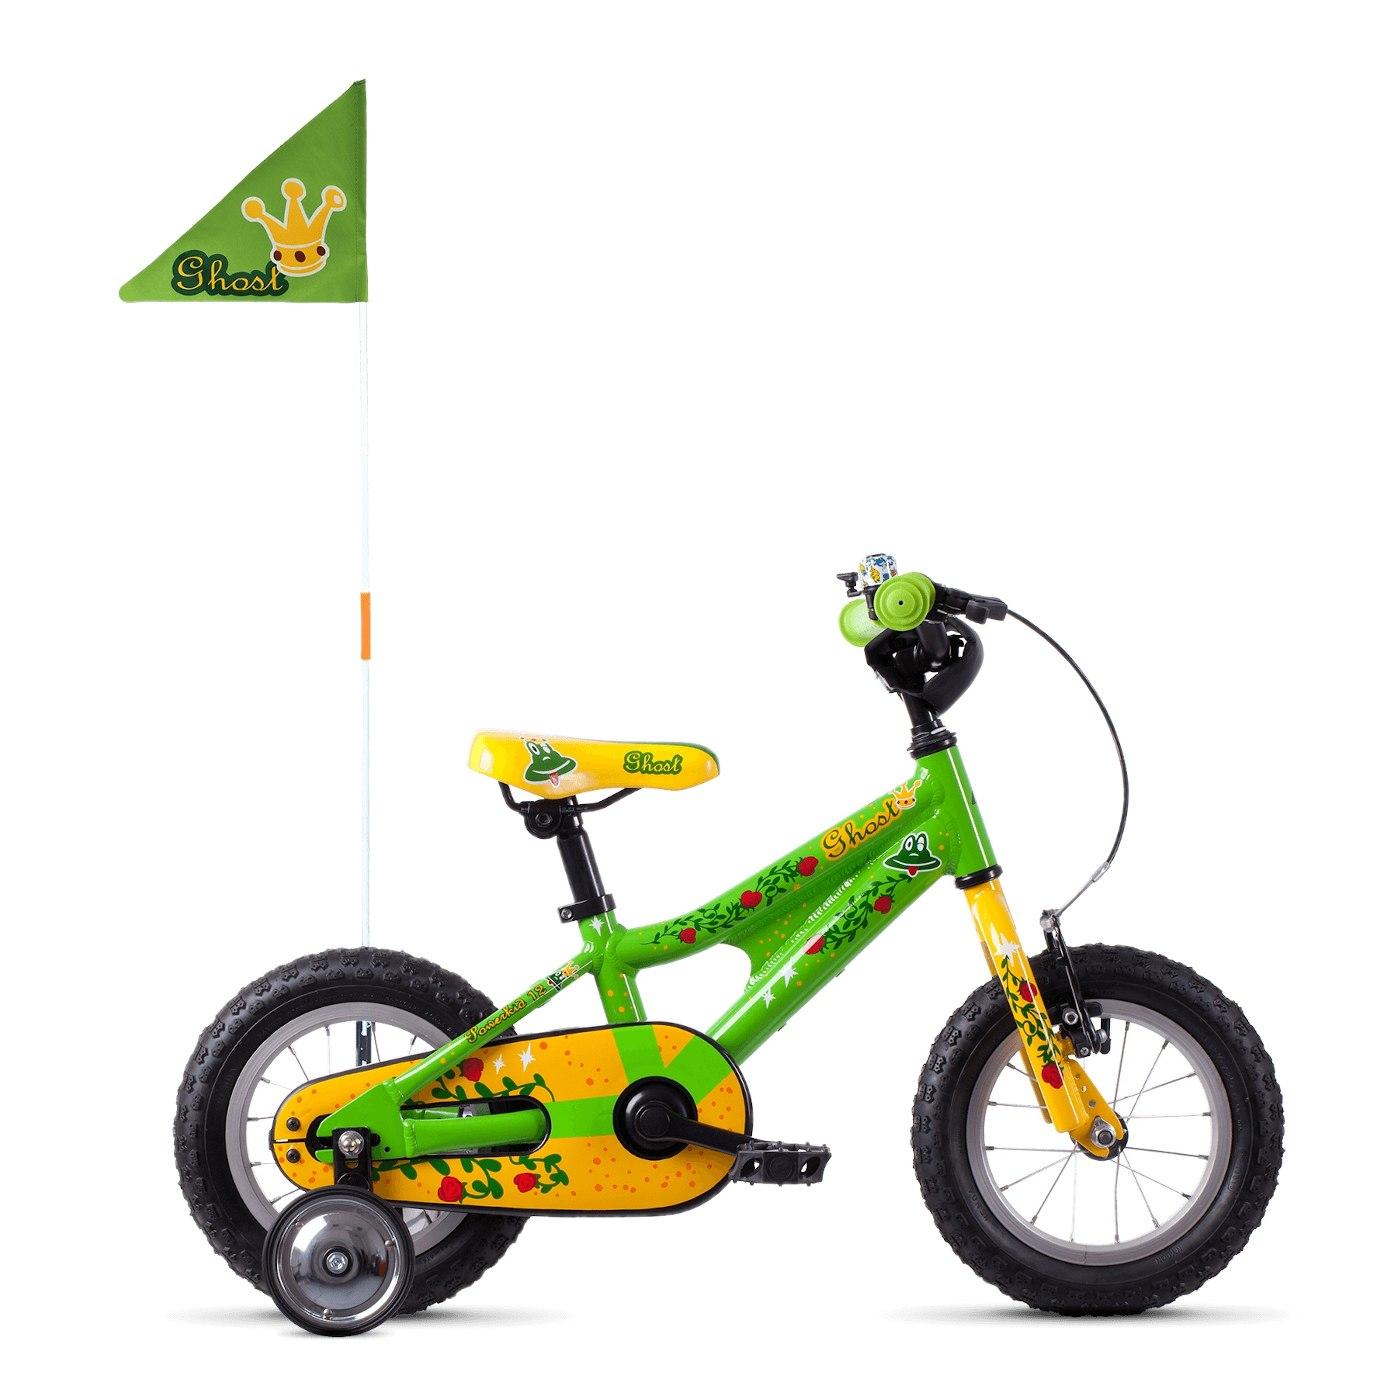 "Ghost POWERKID AL 12 K - 12"" Kids Bike - 2021 - riot green / cane yellow / riot red"